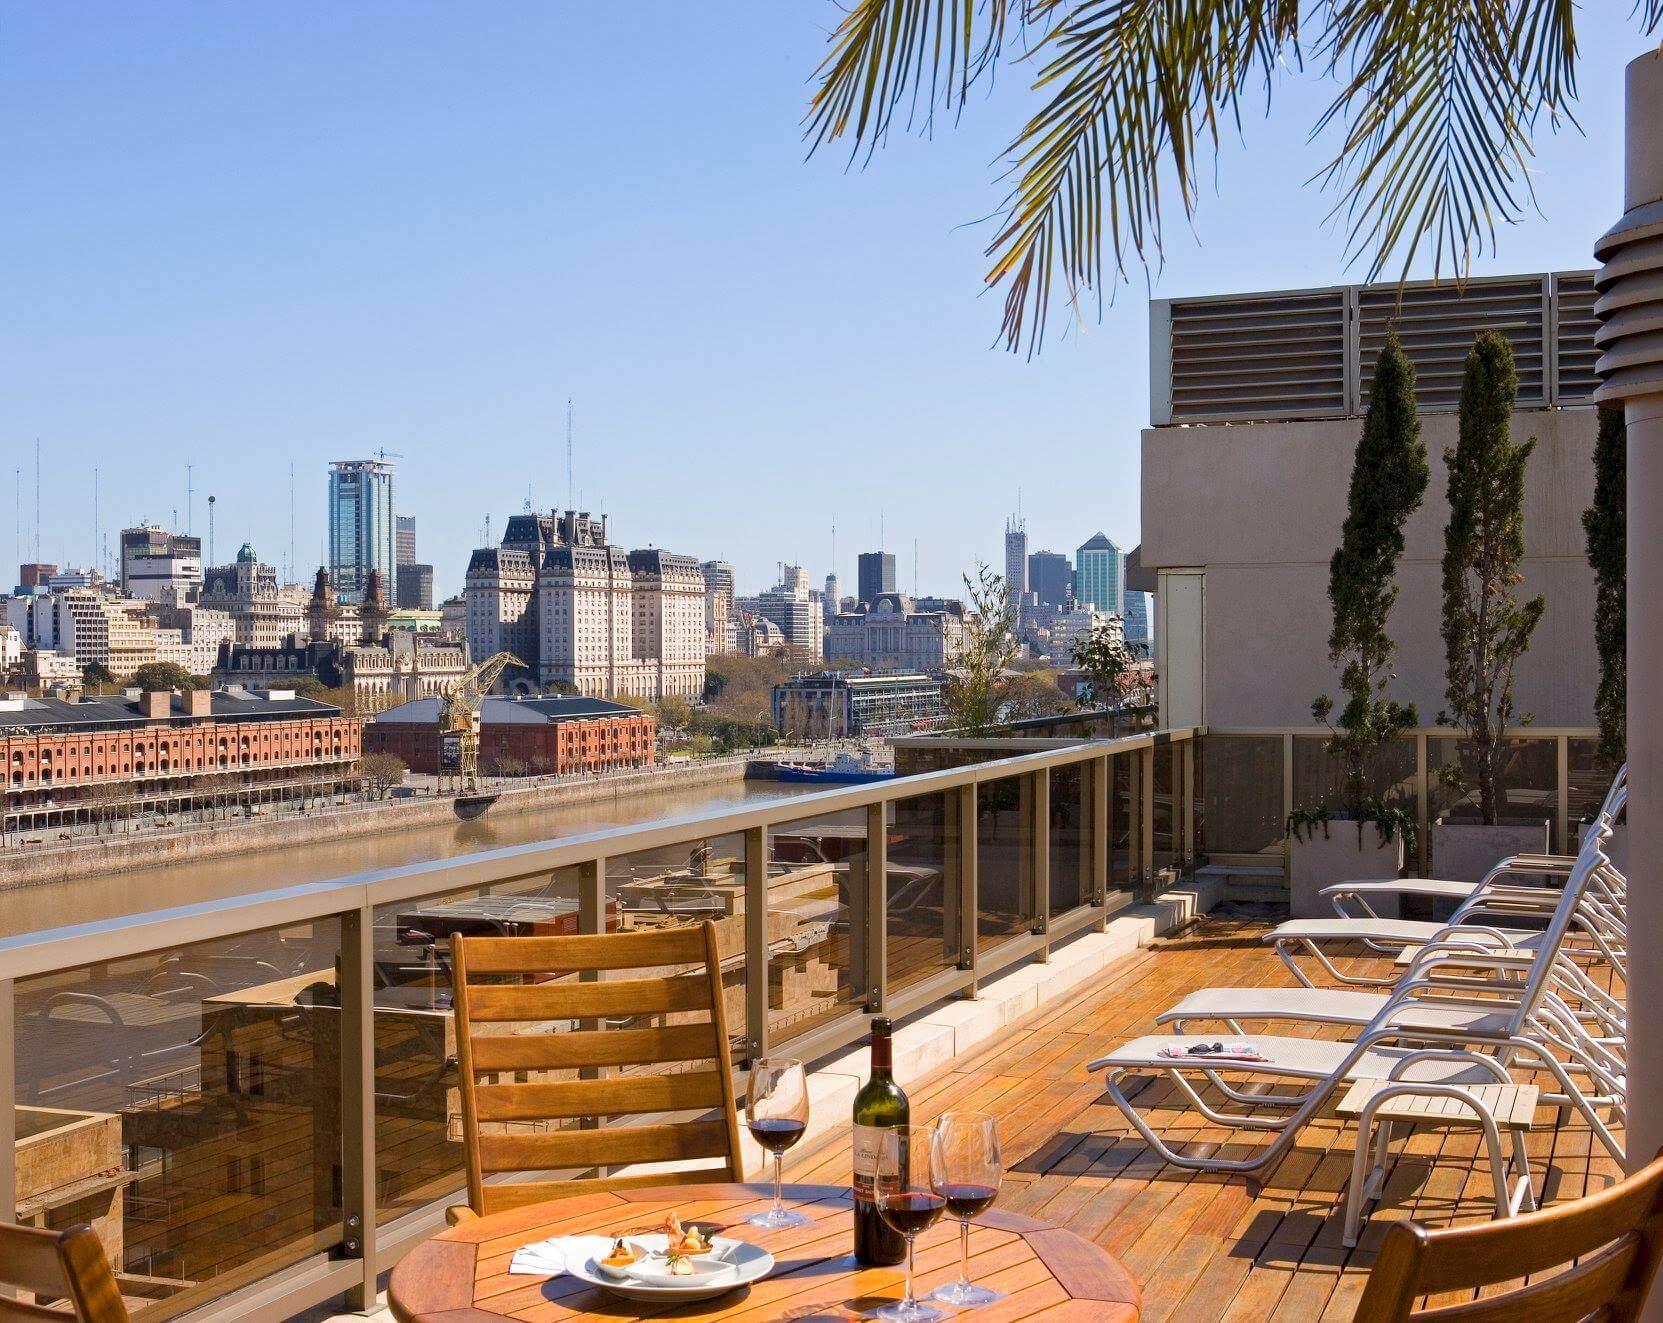 Hotel Madero Sky bar